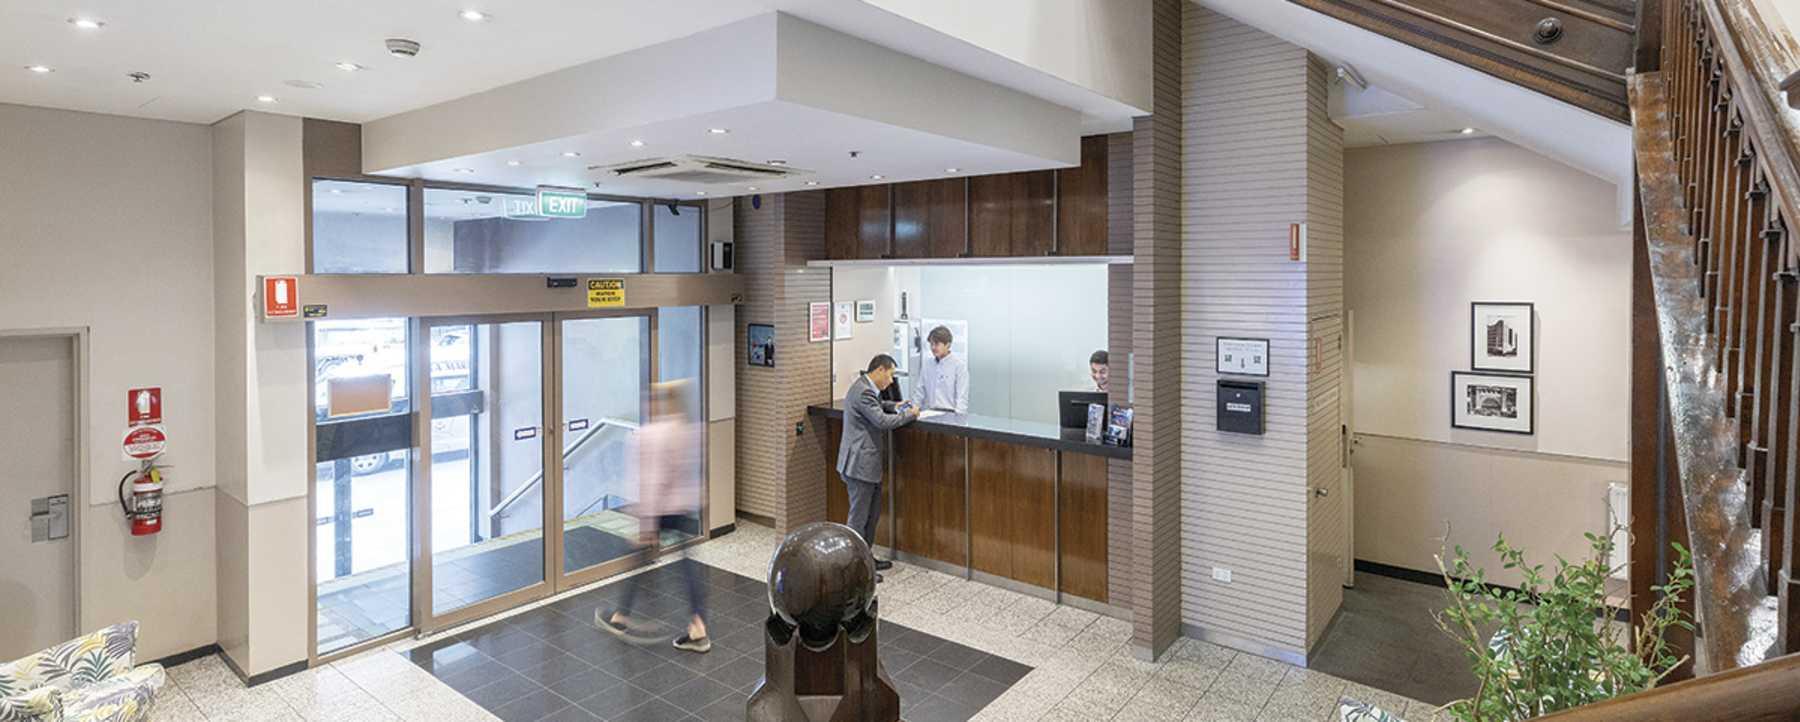 Lobby - Hotel Entrance